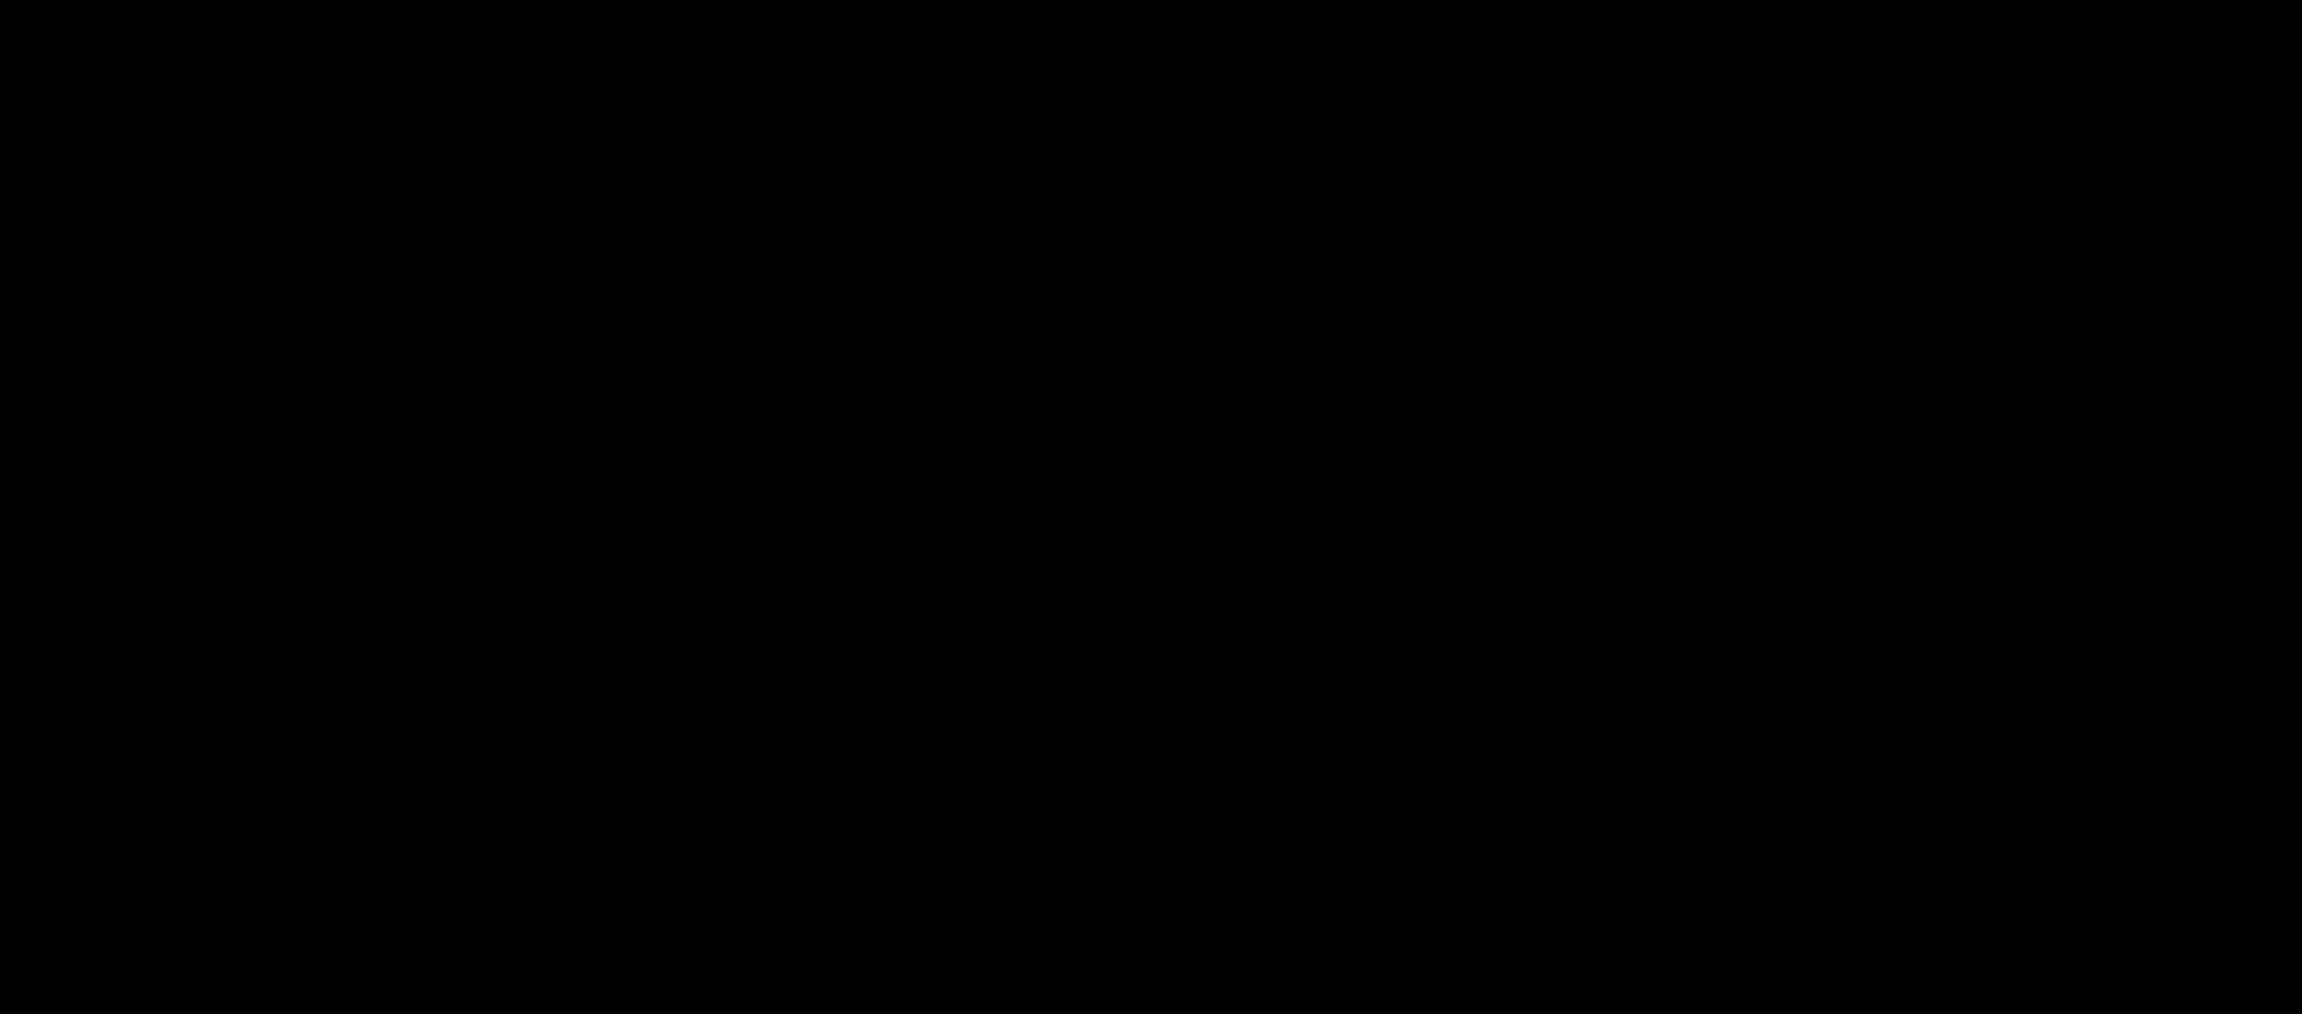 blackhawk silhouette